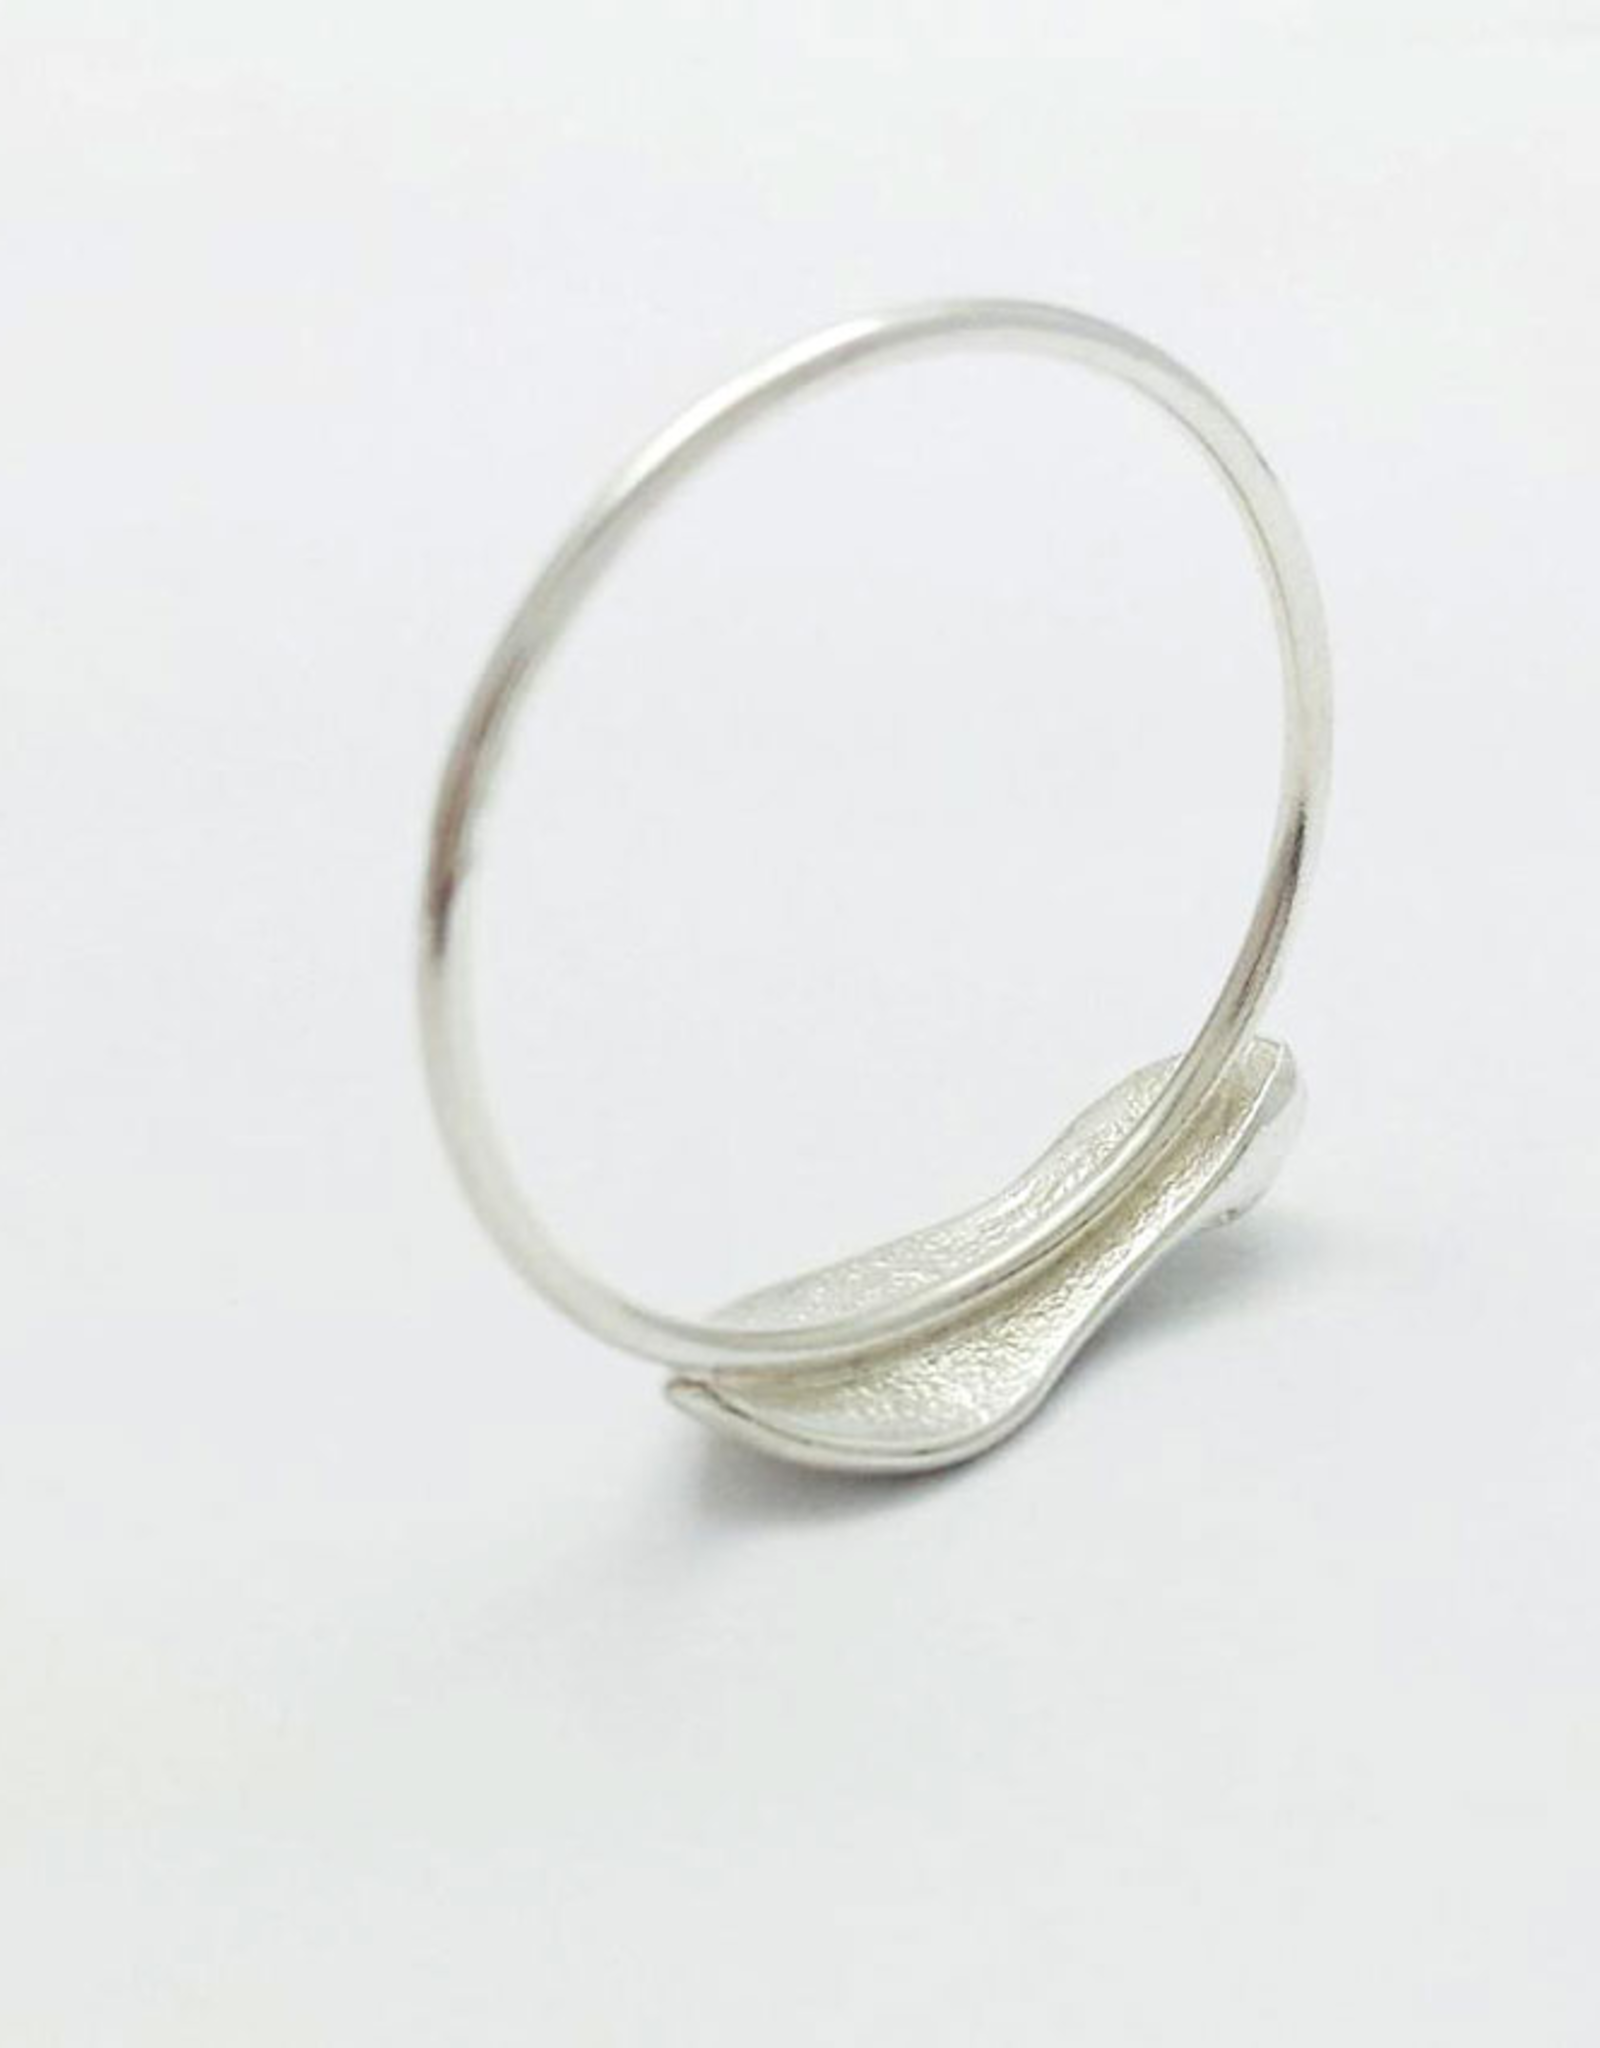 Handmade Cast Maple Key Ring - Sterling Silver